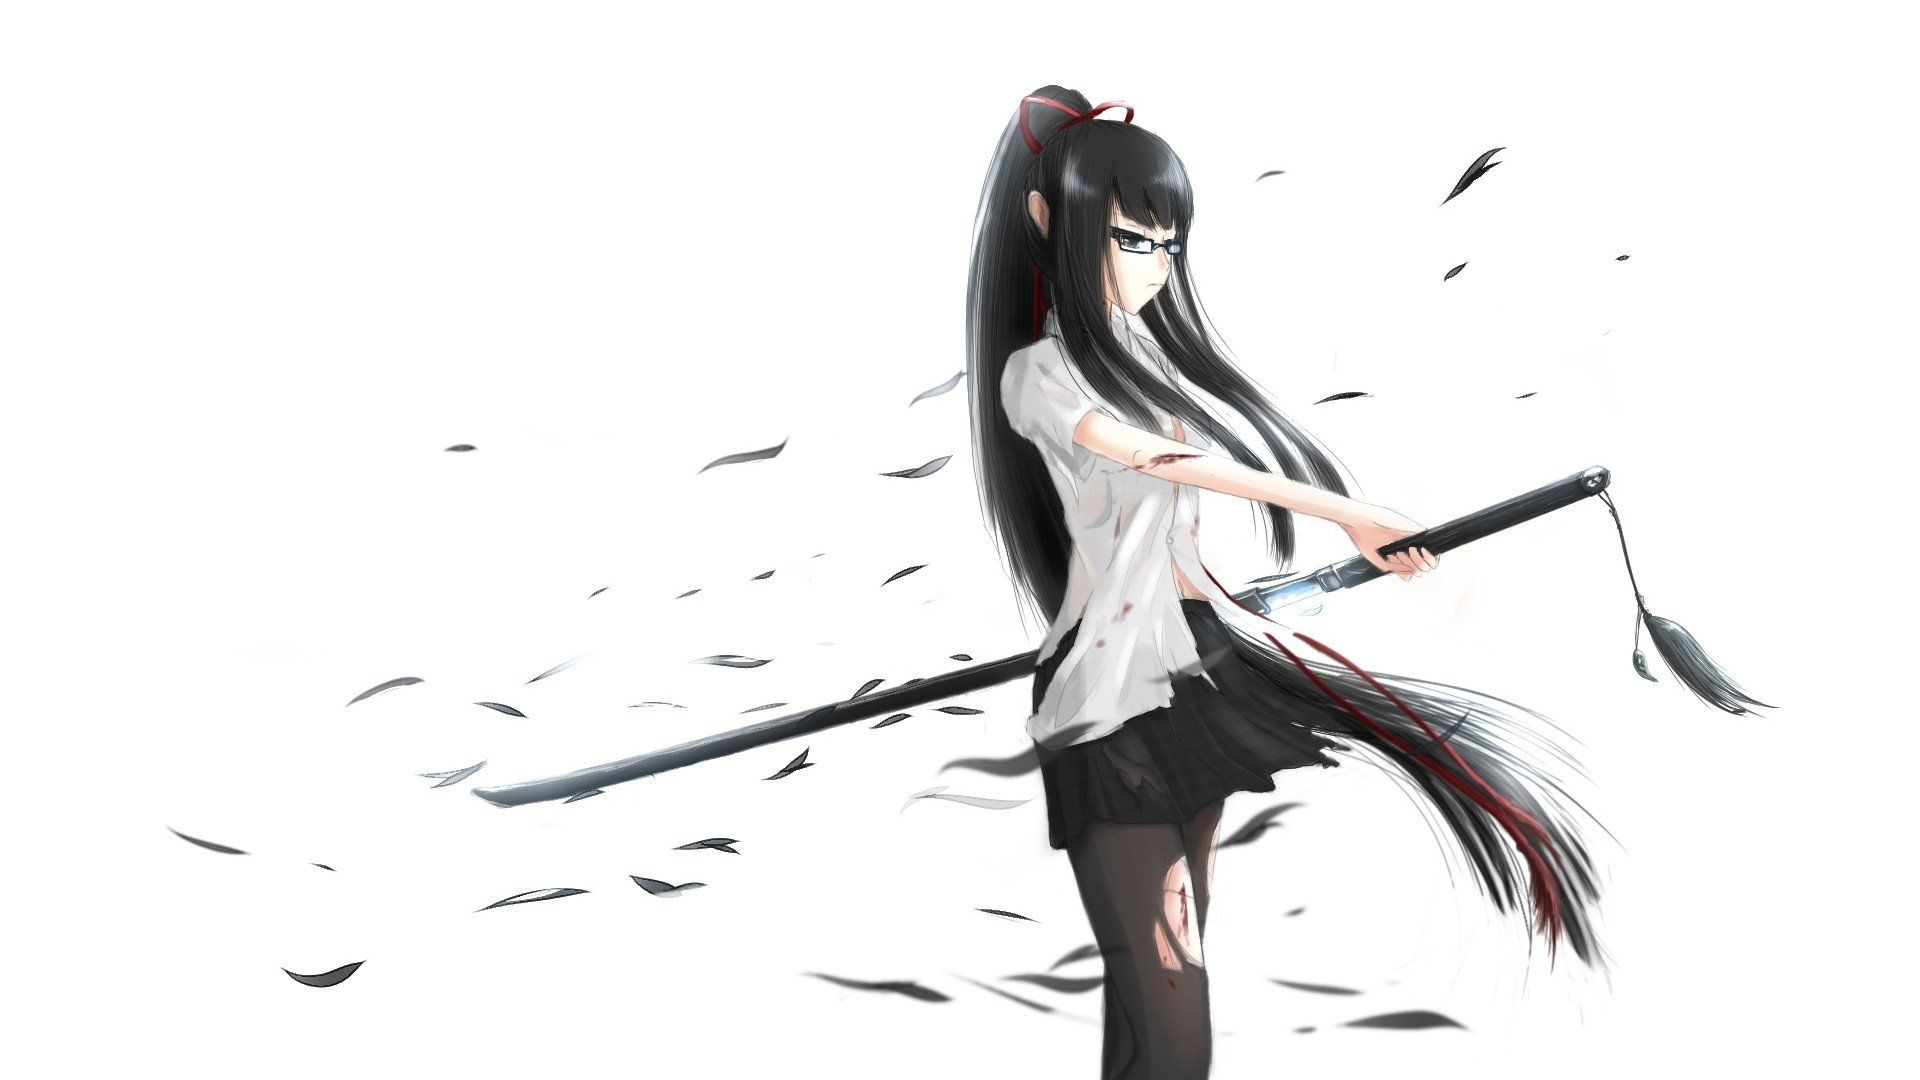 Pin de Romane em Anime  Anime girlfriend, Madara wallpapers